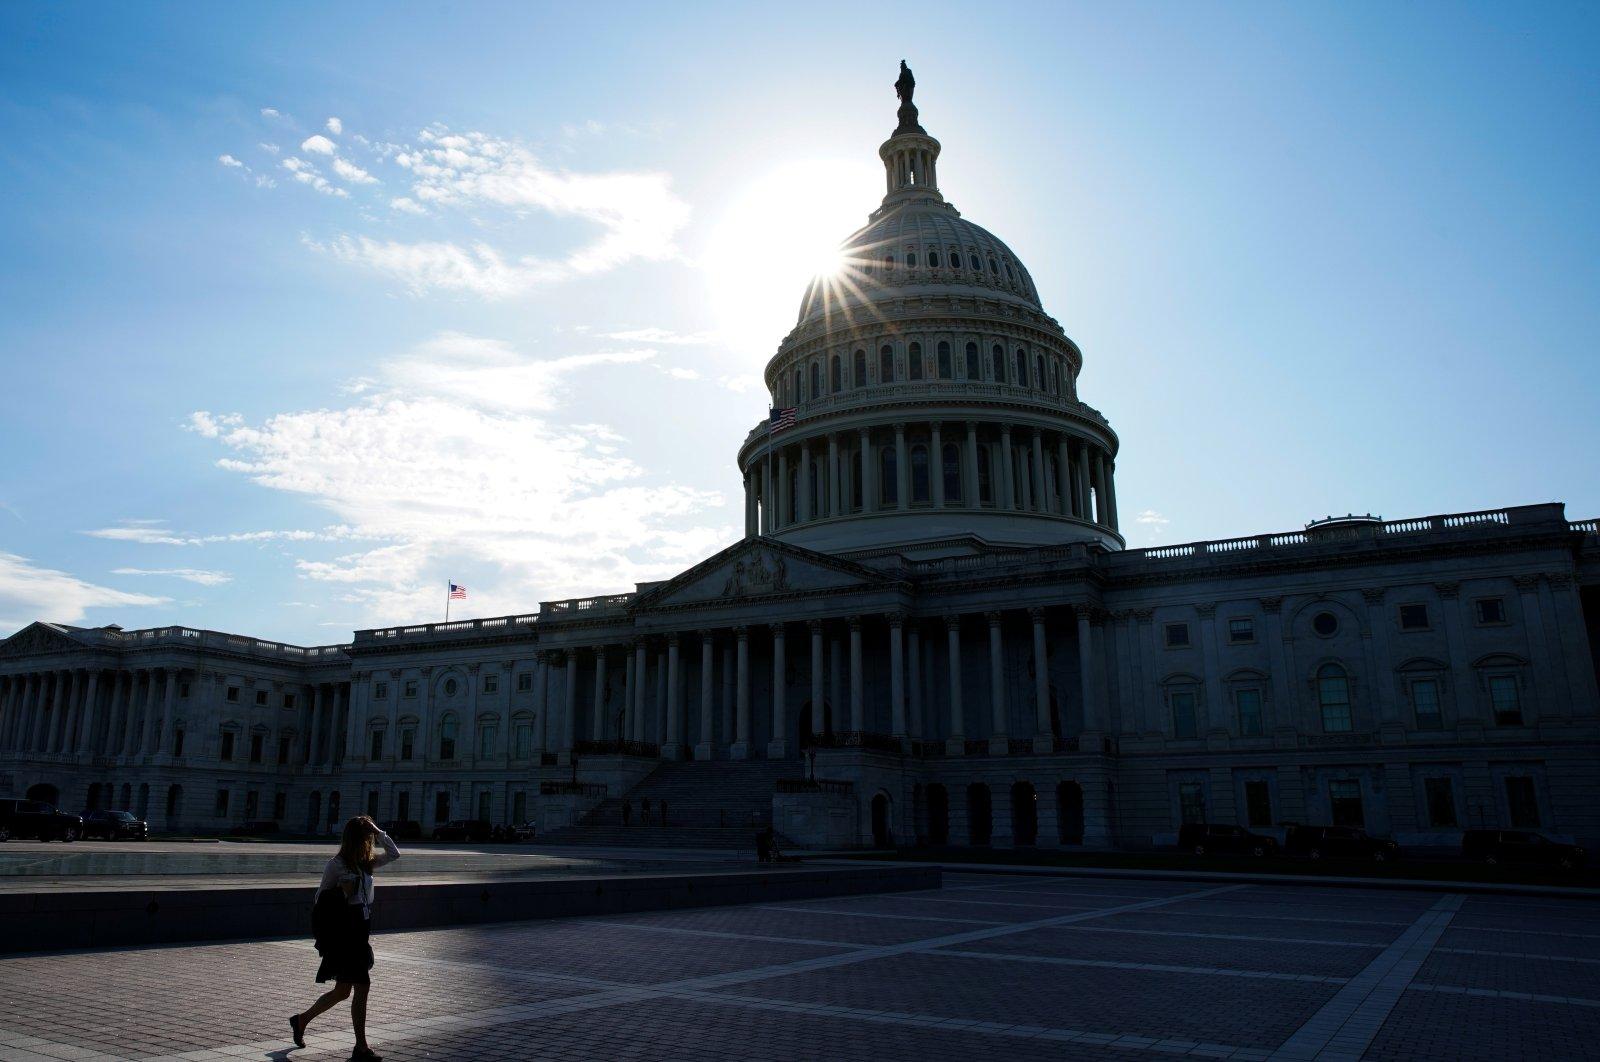 The U.S. Capitol is seen in Washington, U.S., Sept. 27, 2021. (Reuters Photo)